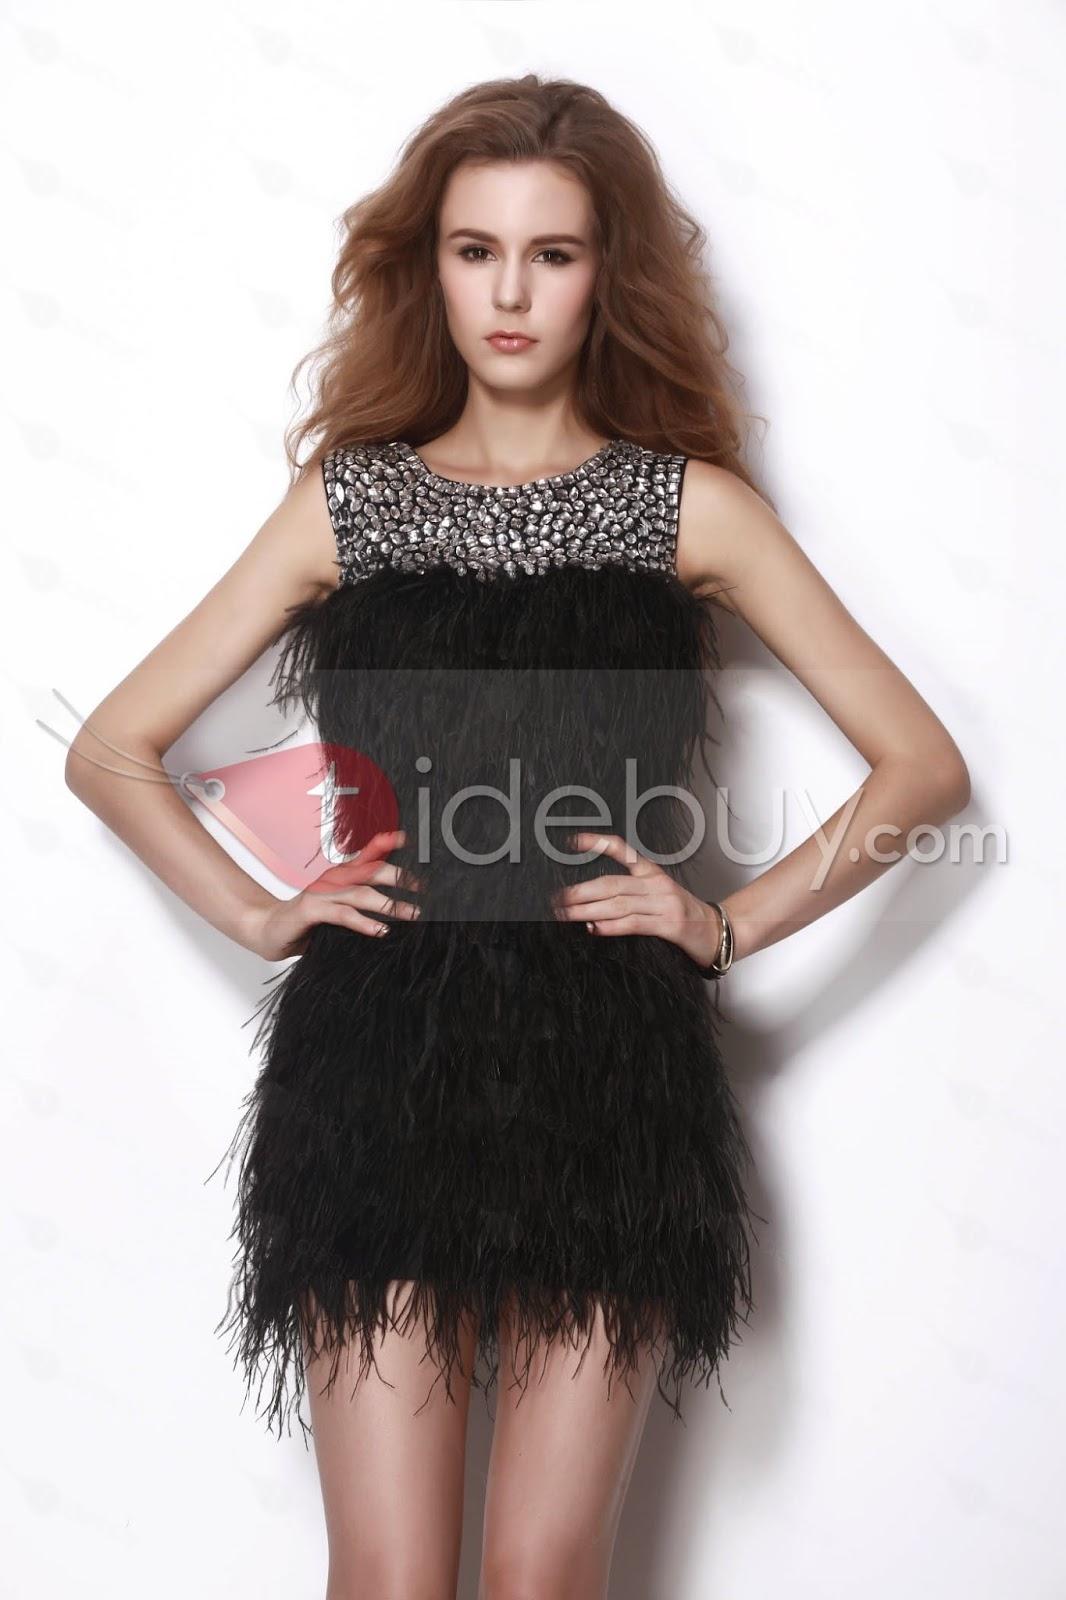 http://es.tidebuy.com/producto/Vestido-de-Prom-Columna-Escote-Cuello-Largo-Mini-Ruffles-Alicjas-9654203.html